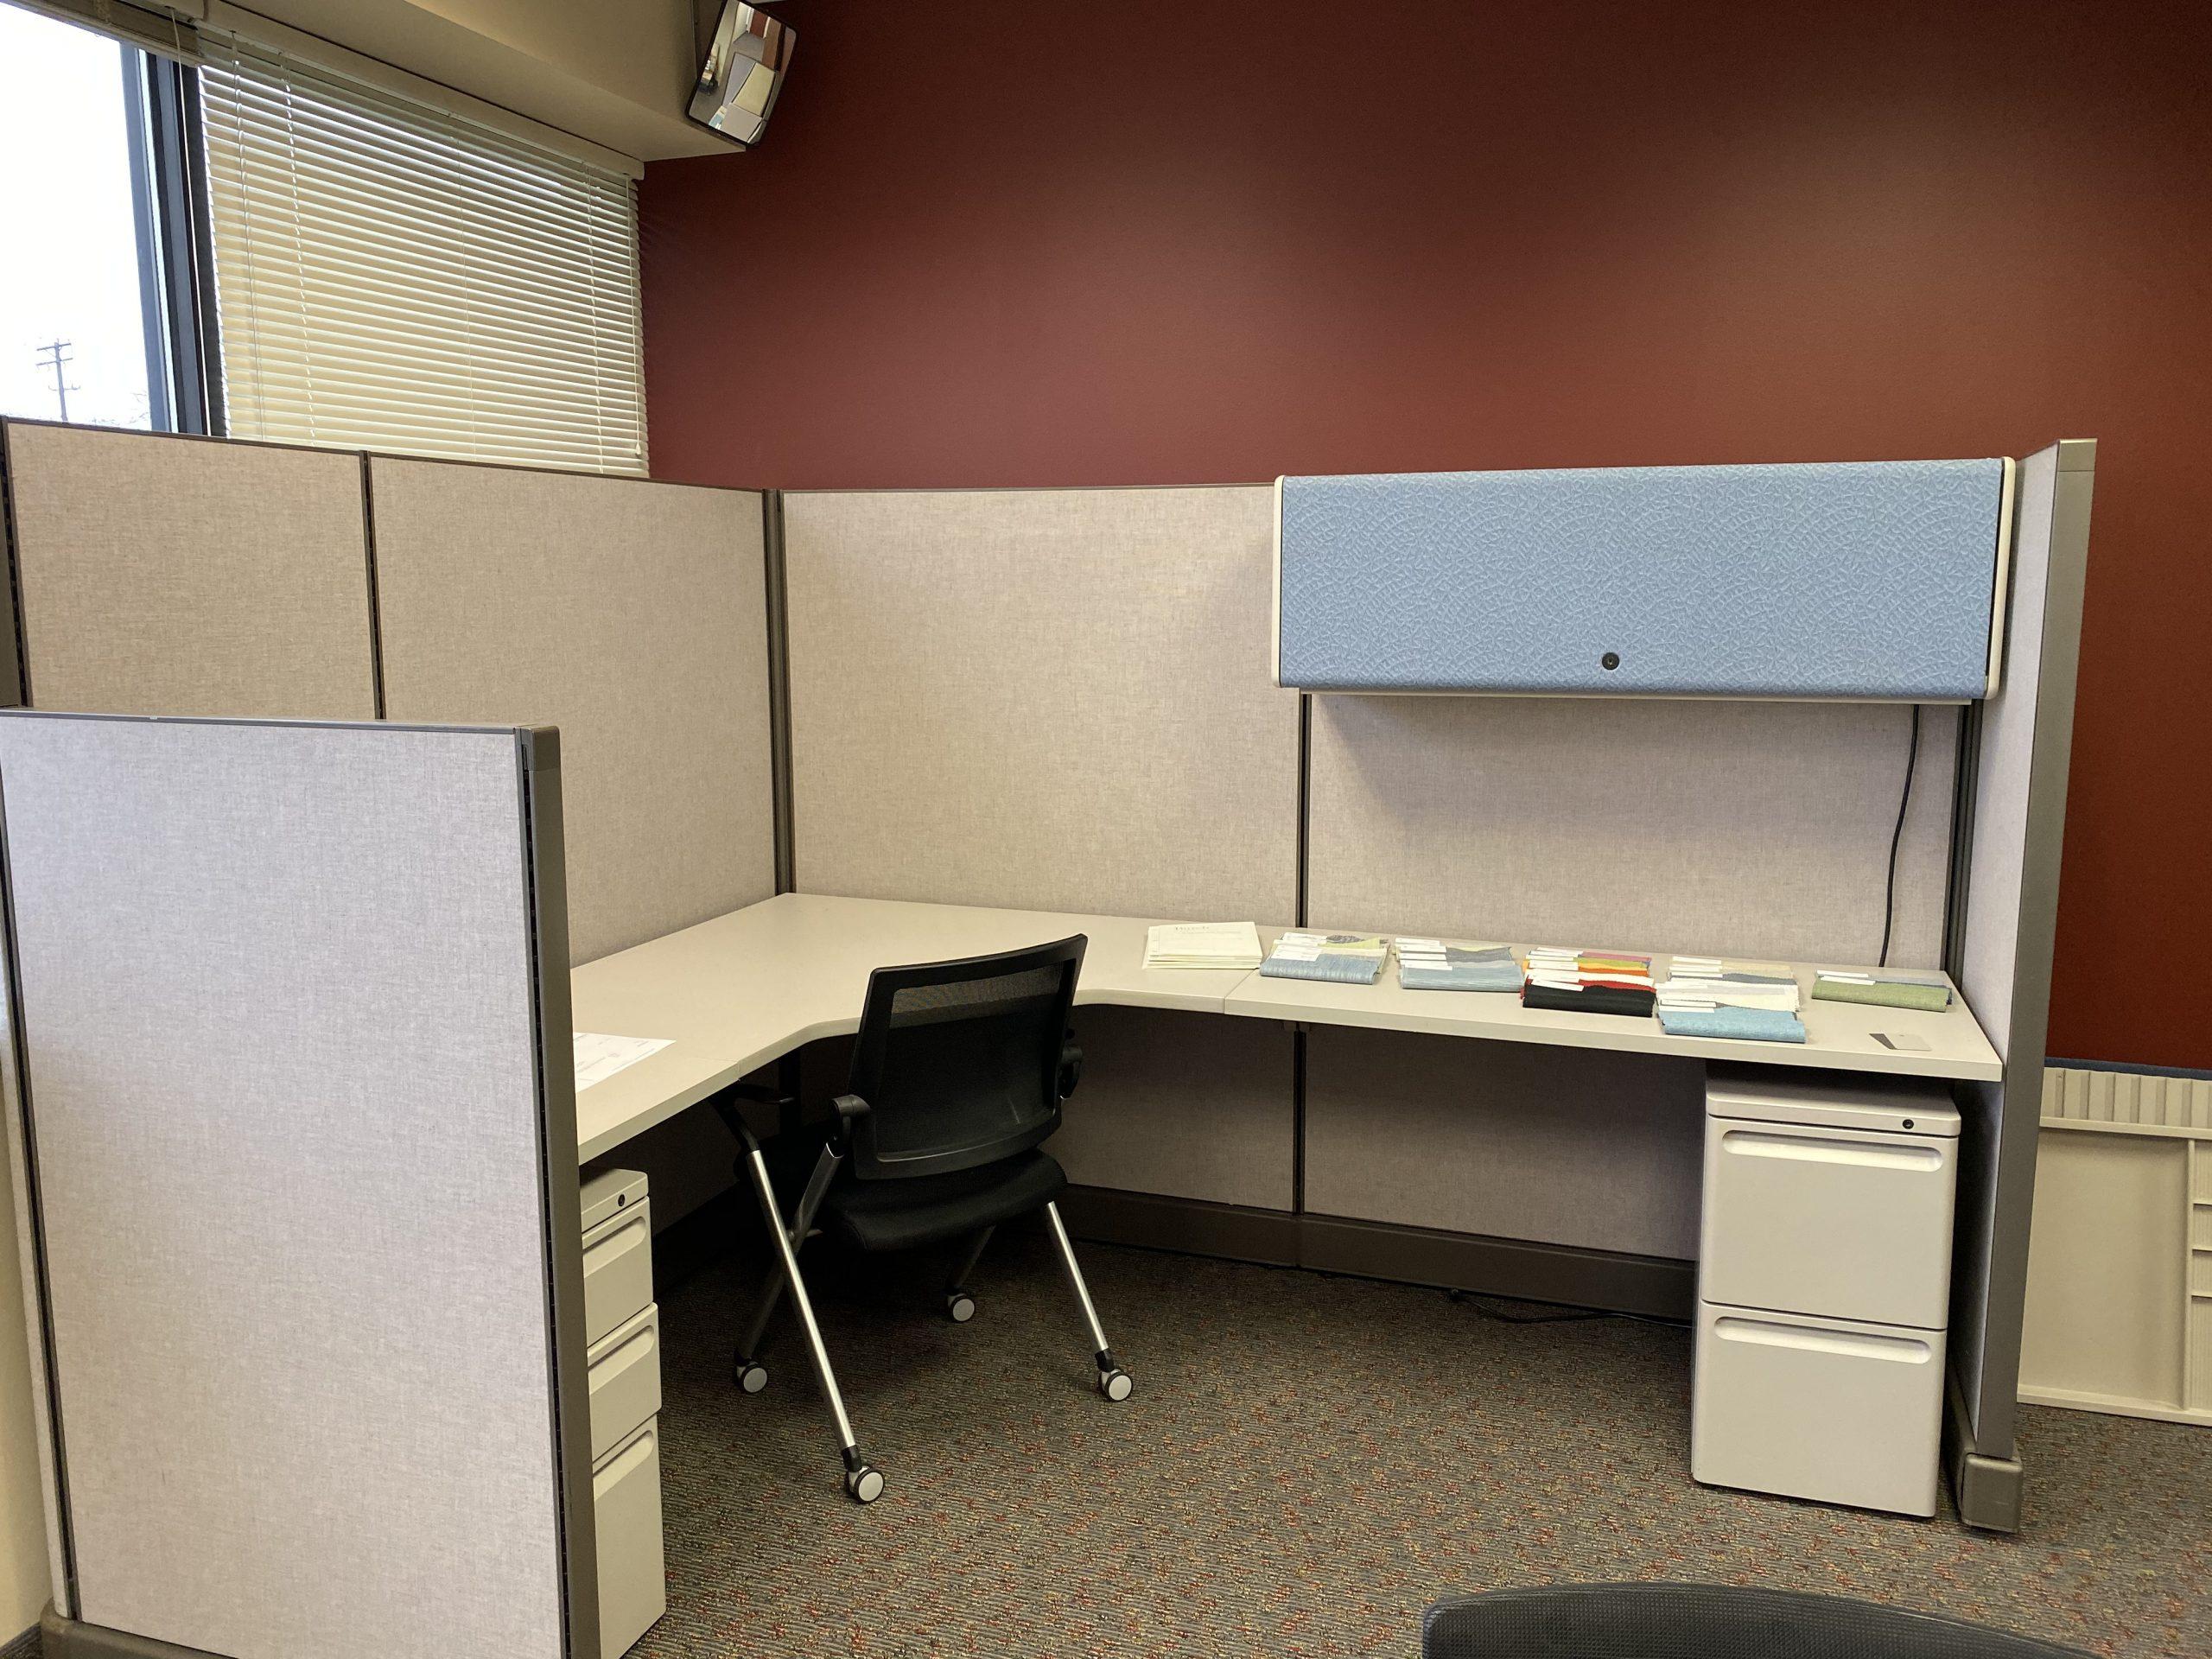 Medtone Trim, Intertone Light Storage, Desk Tops